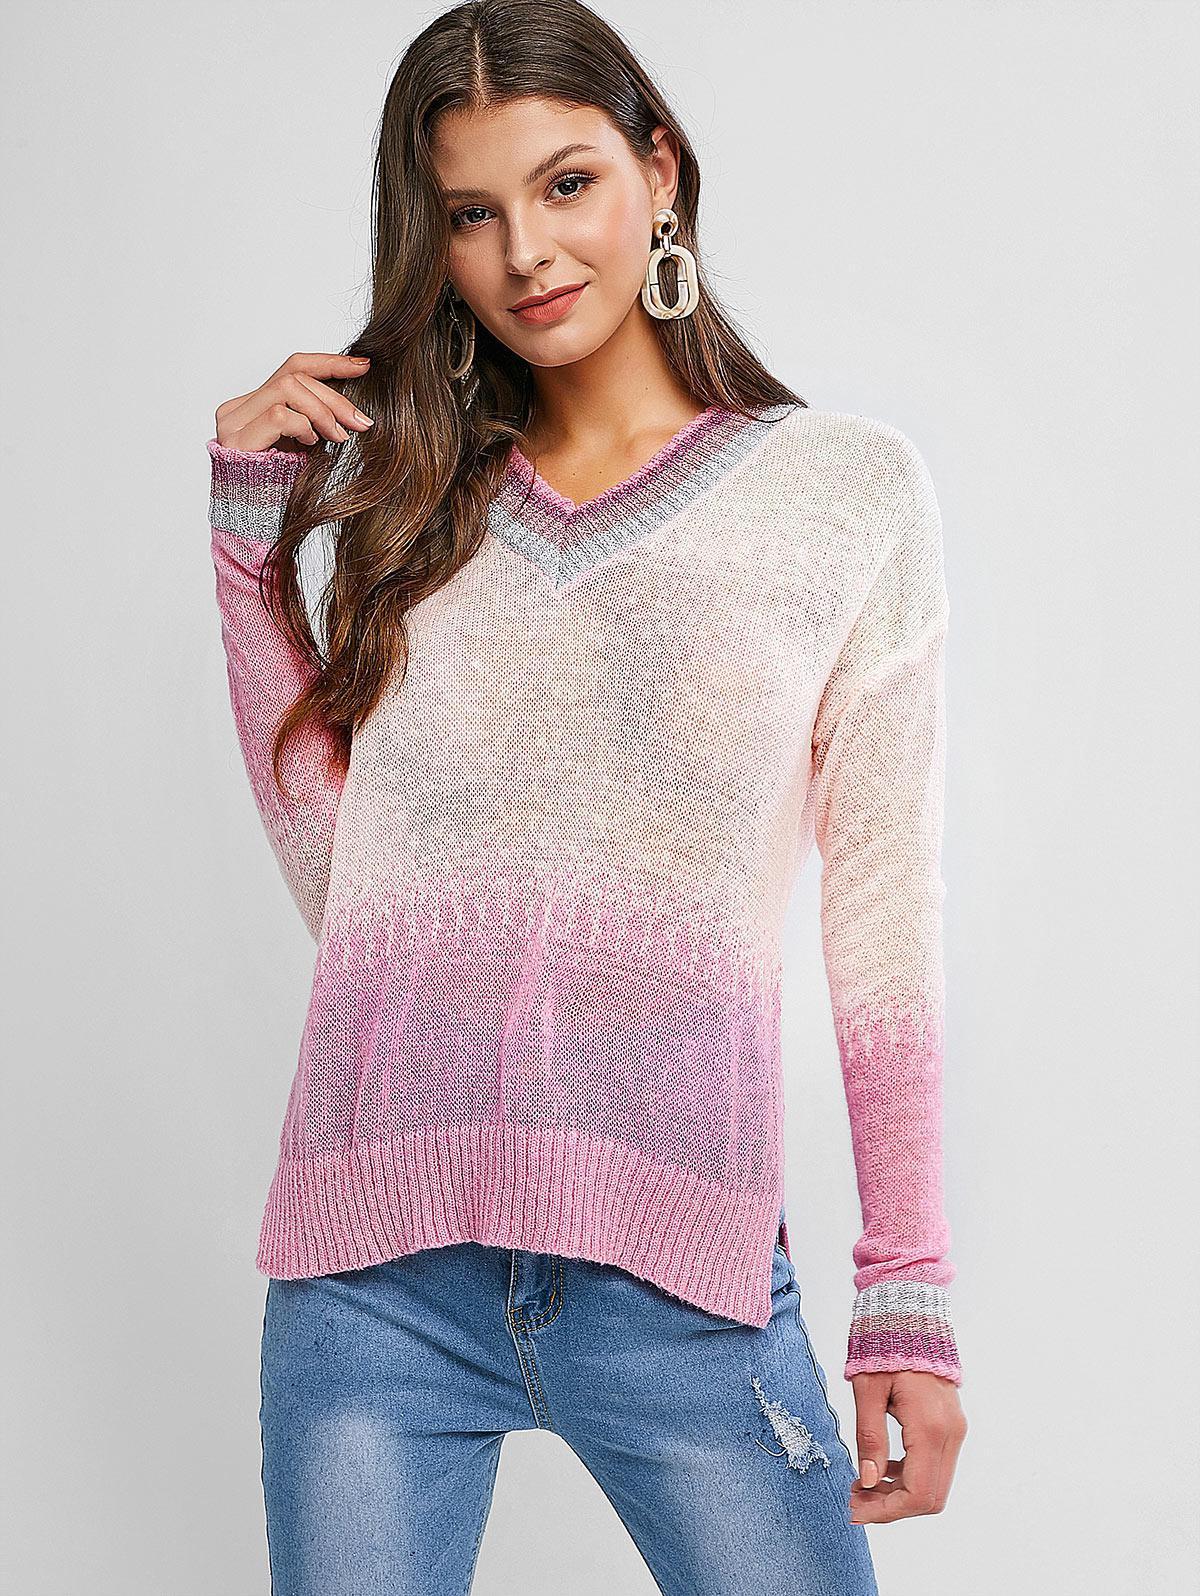 Striped Trim V Neck Gradient Open Knit Sweater